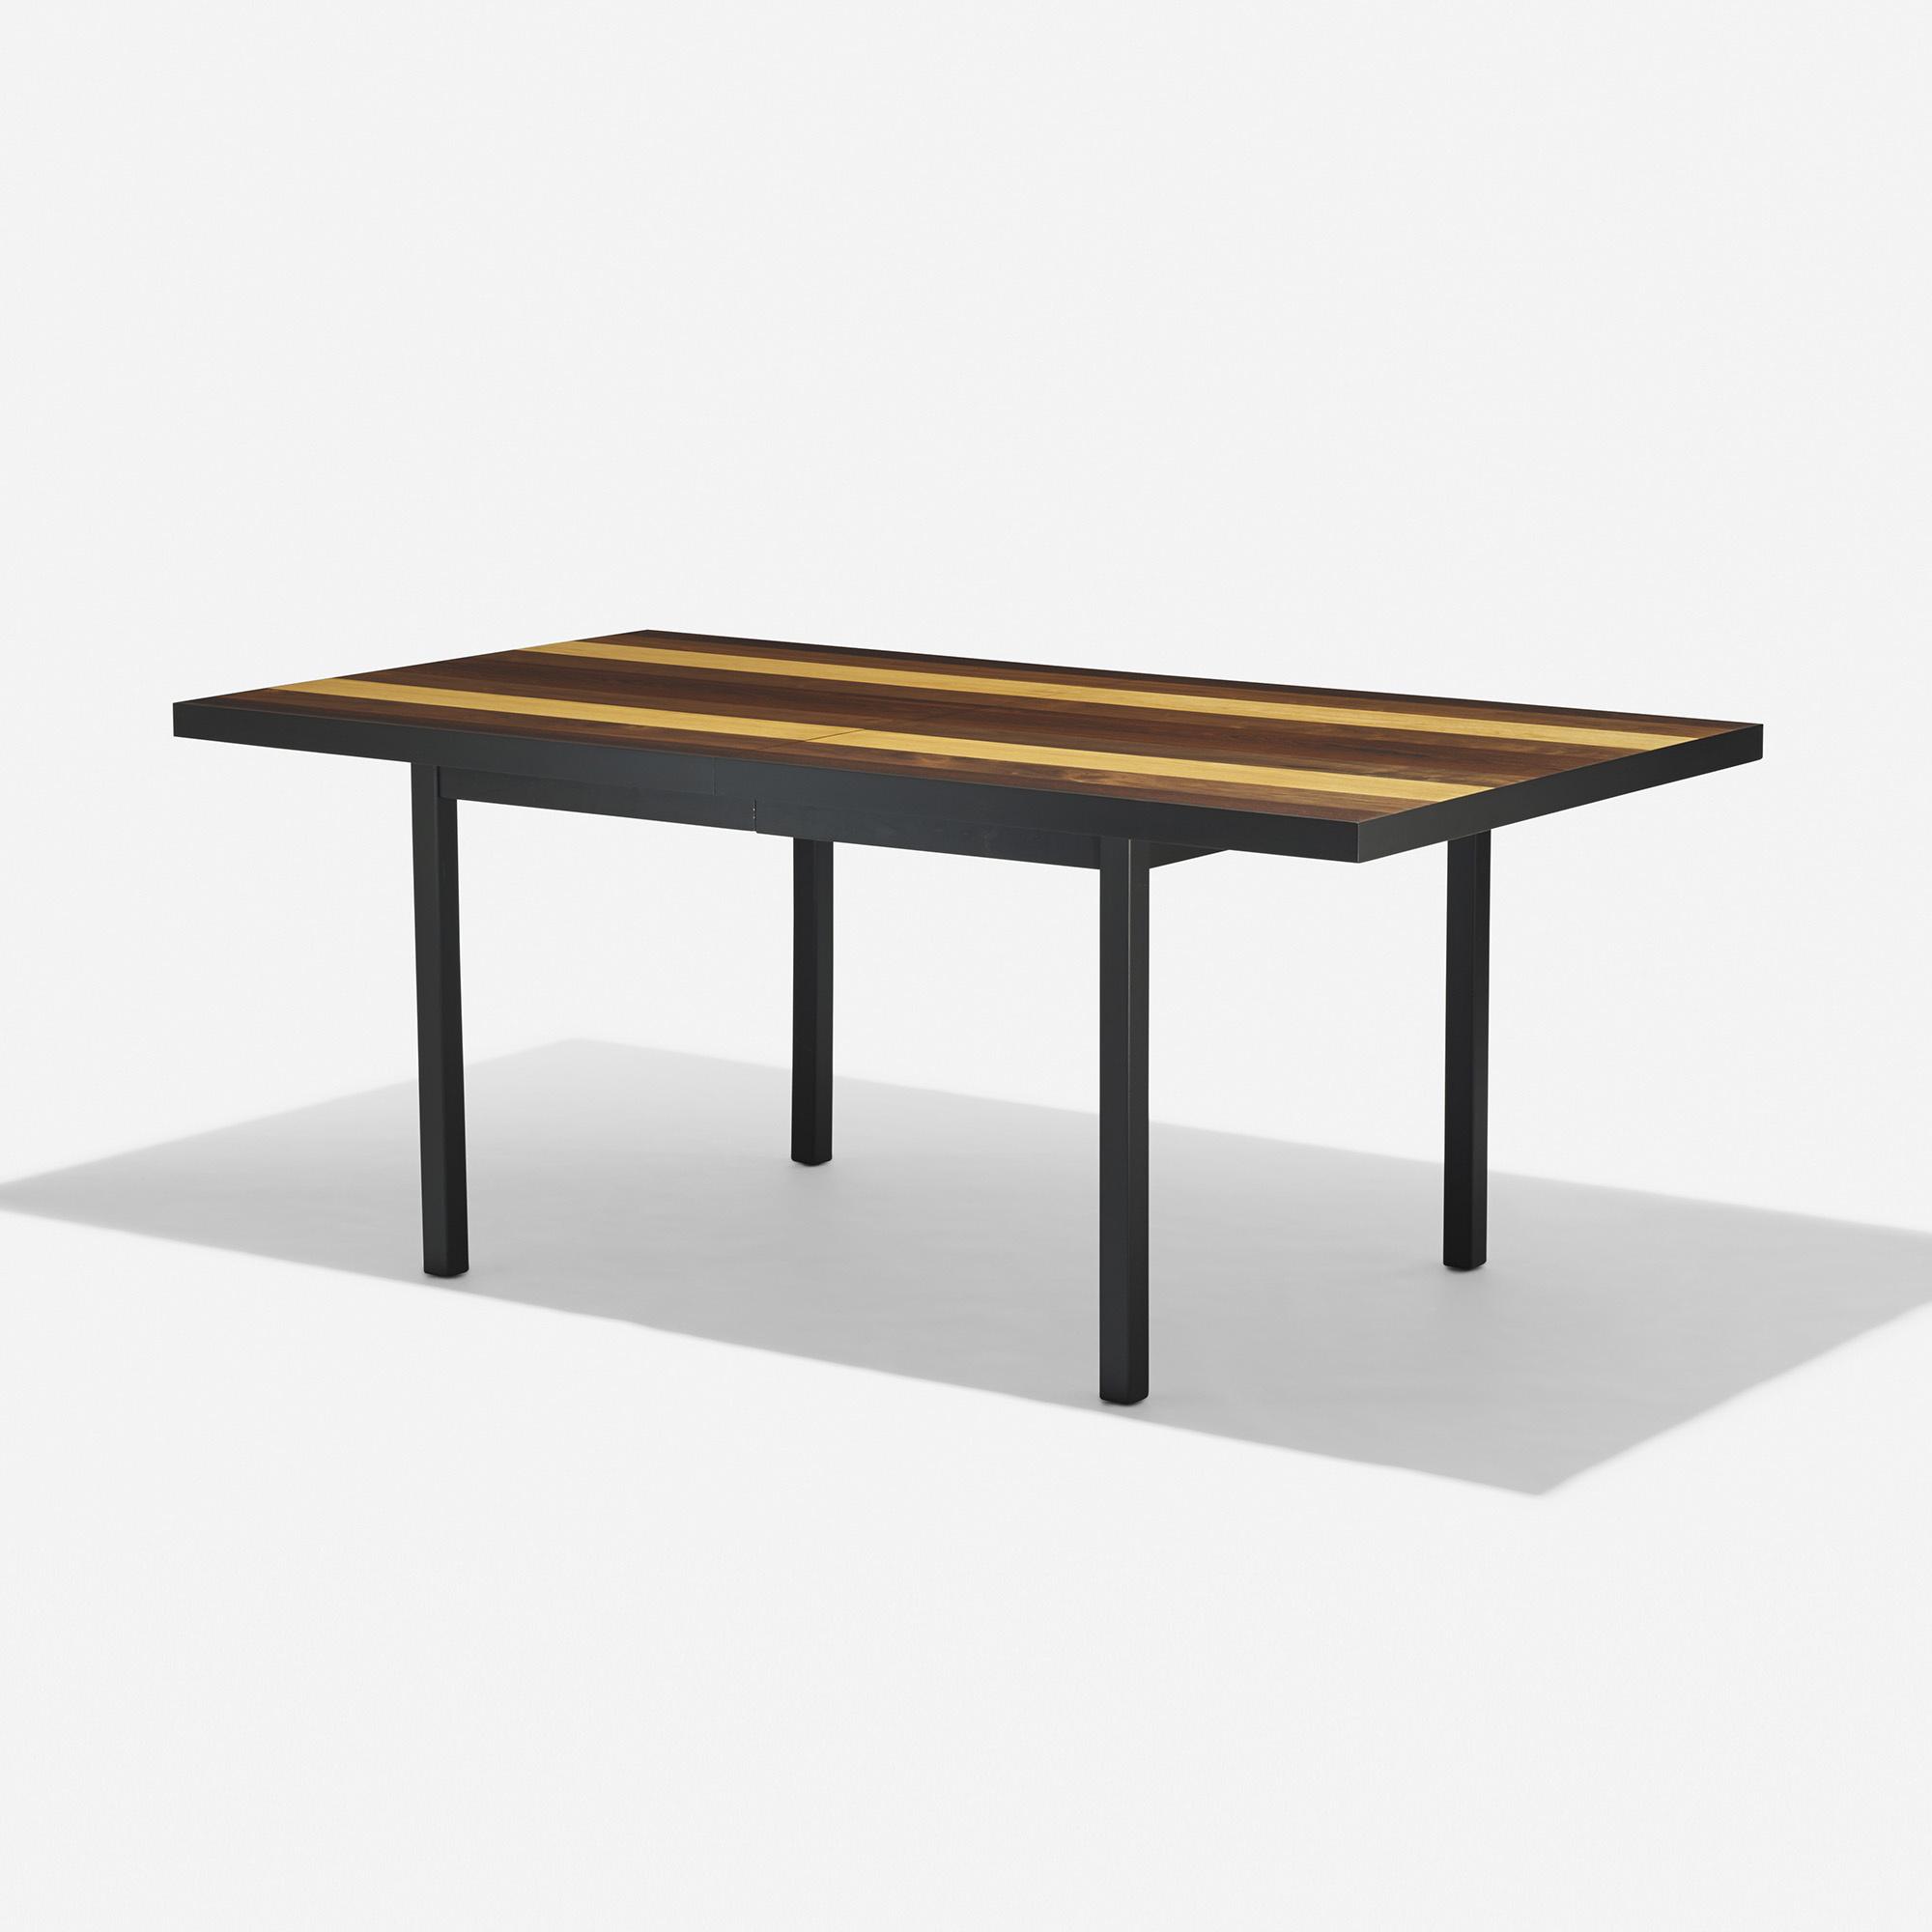 391: Milo Baughman / Dining Table (1 Of 3)